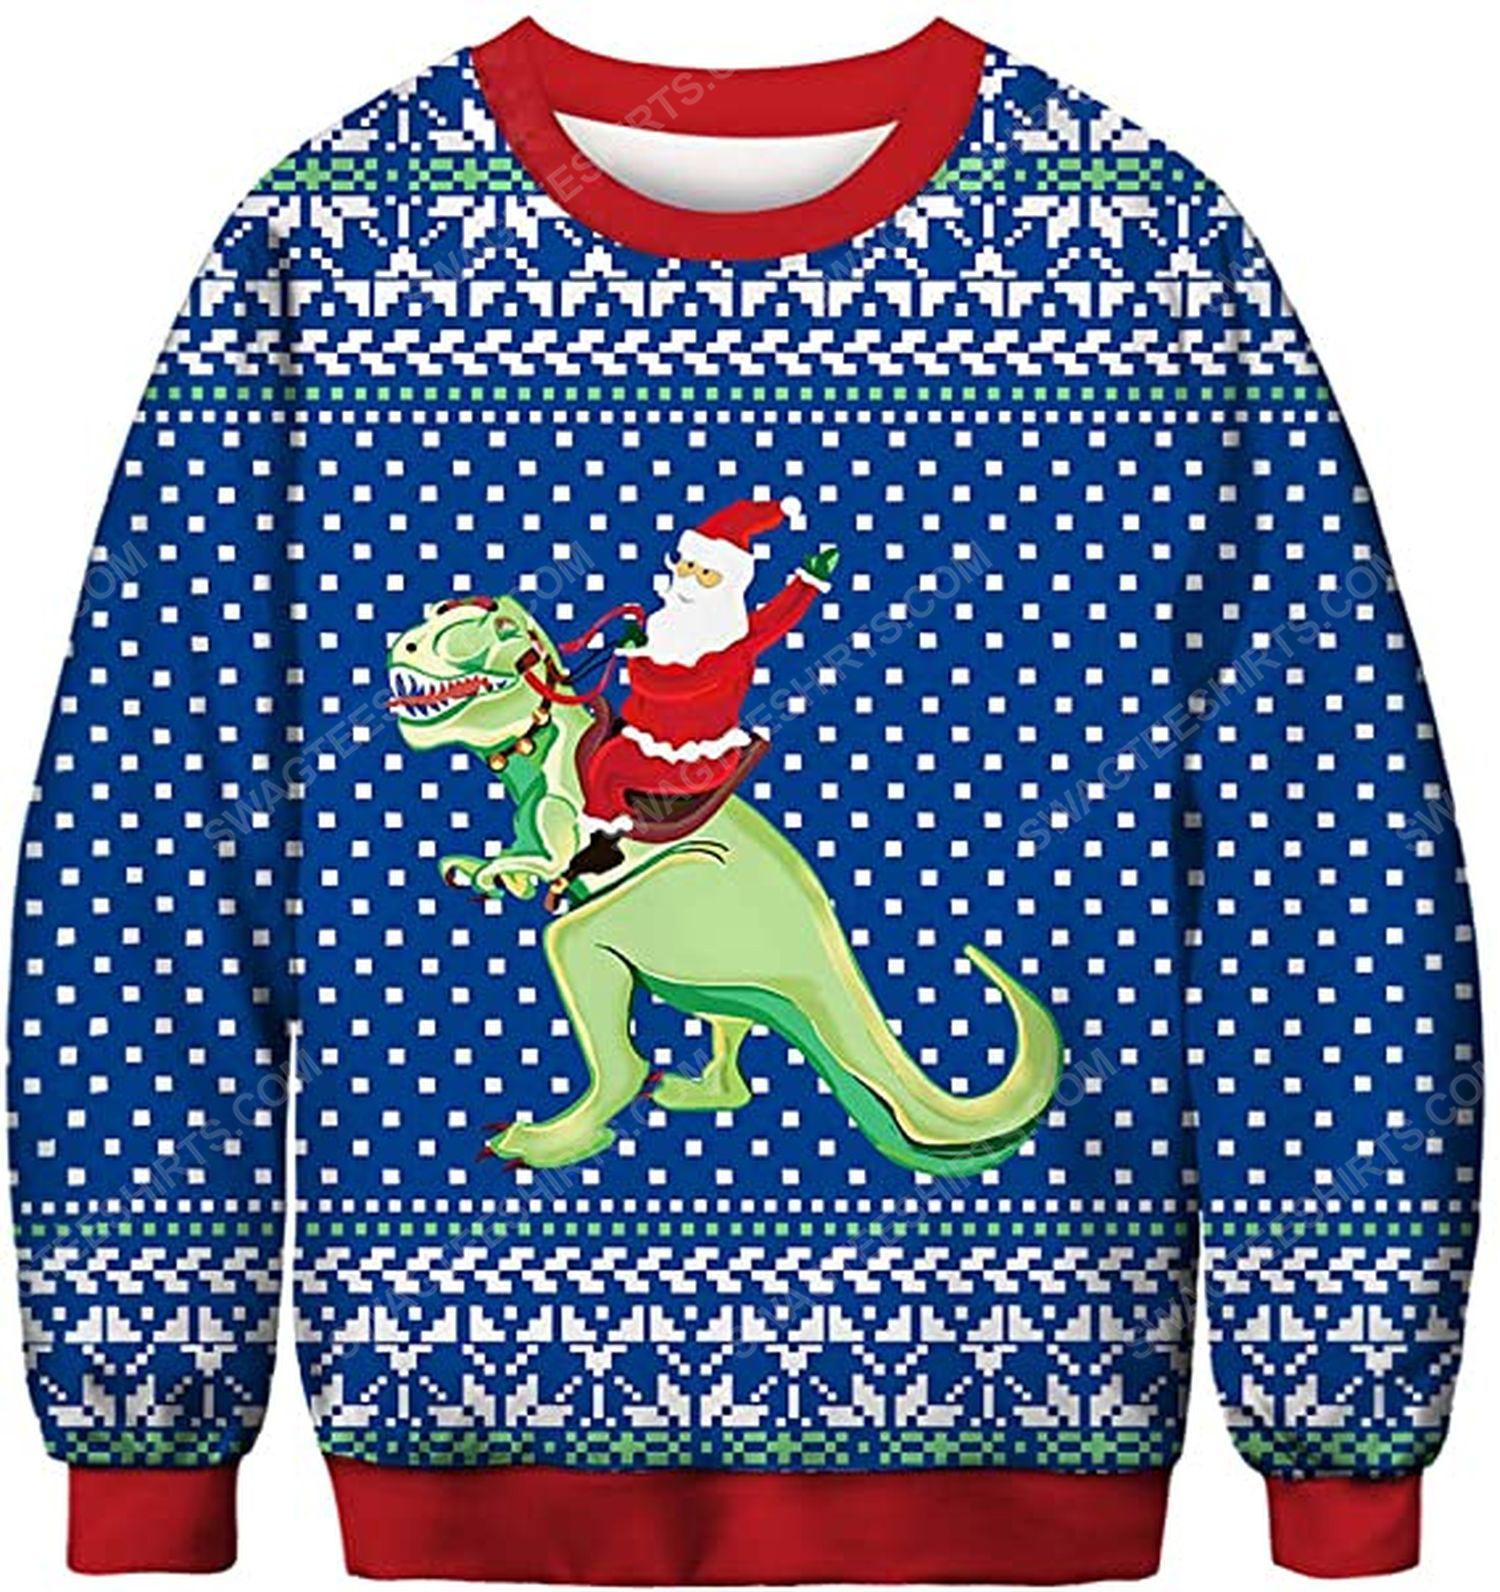 Santa claus riding a dinosaur full print ugly christmas sweater 2 - Copy